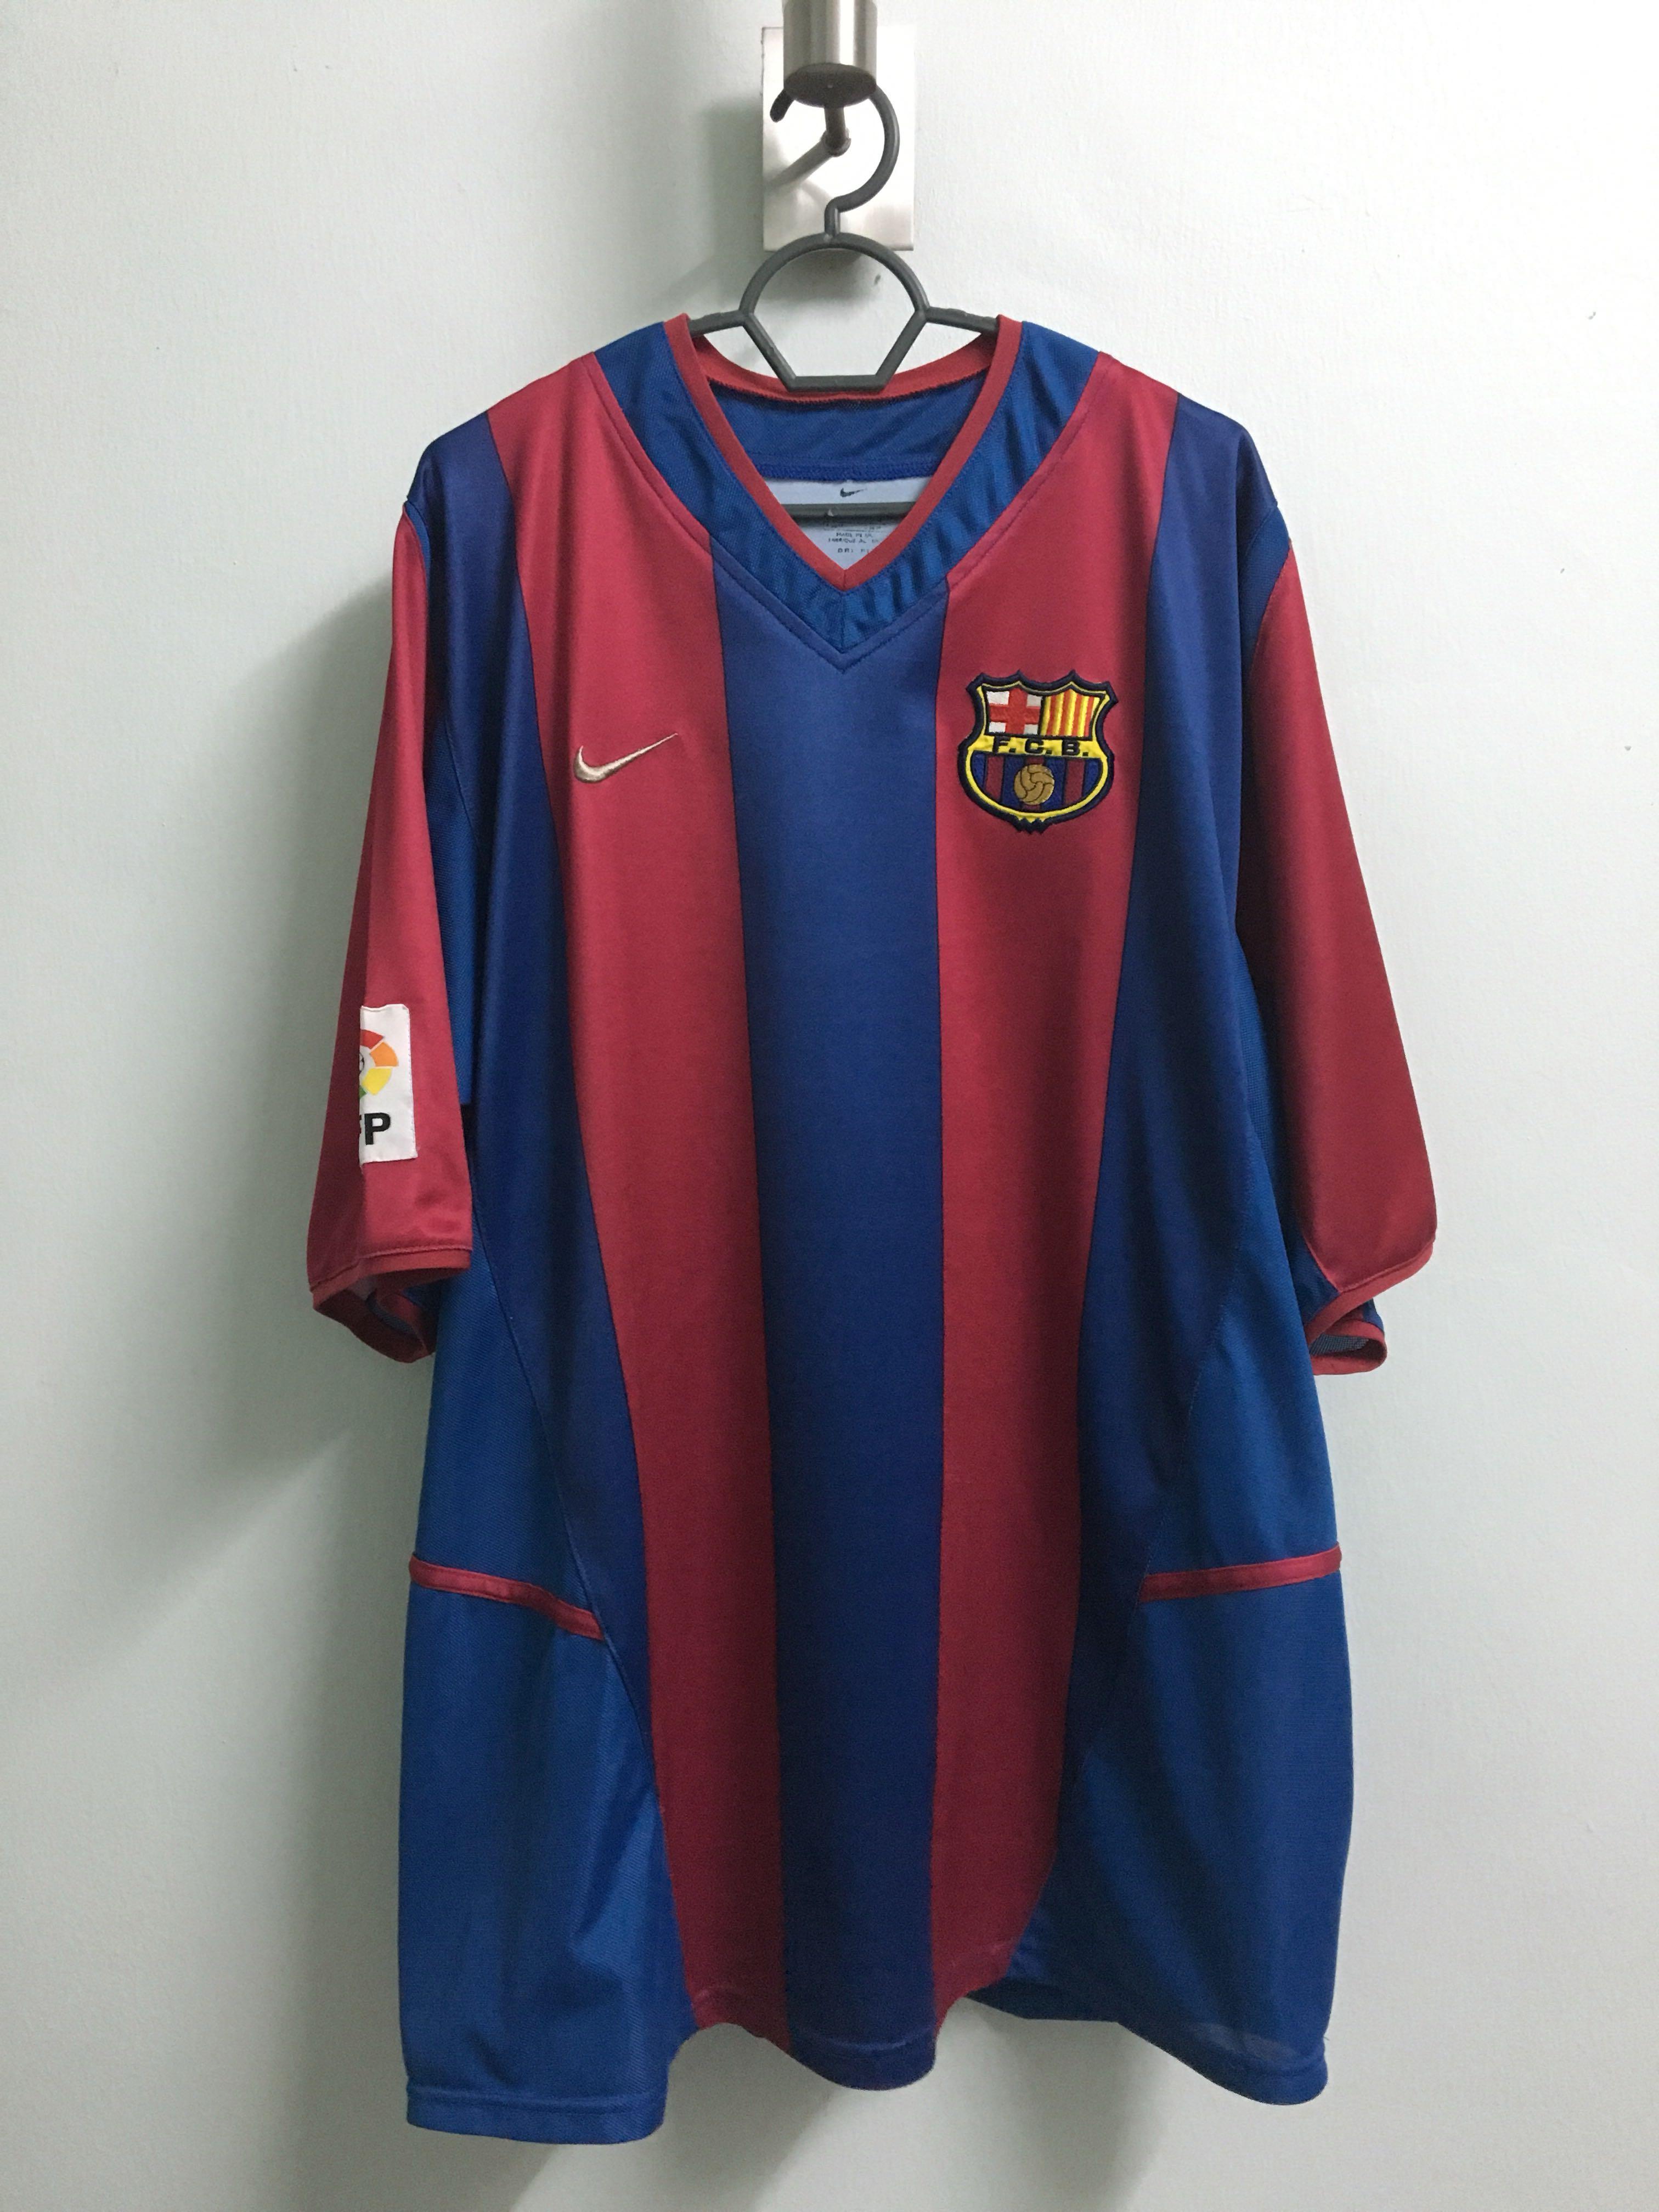 1f3c5985334 Nike Football 2002-03 season FC Barcelona Jersey